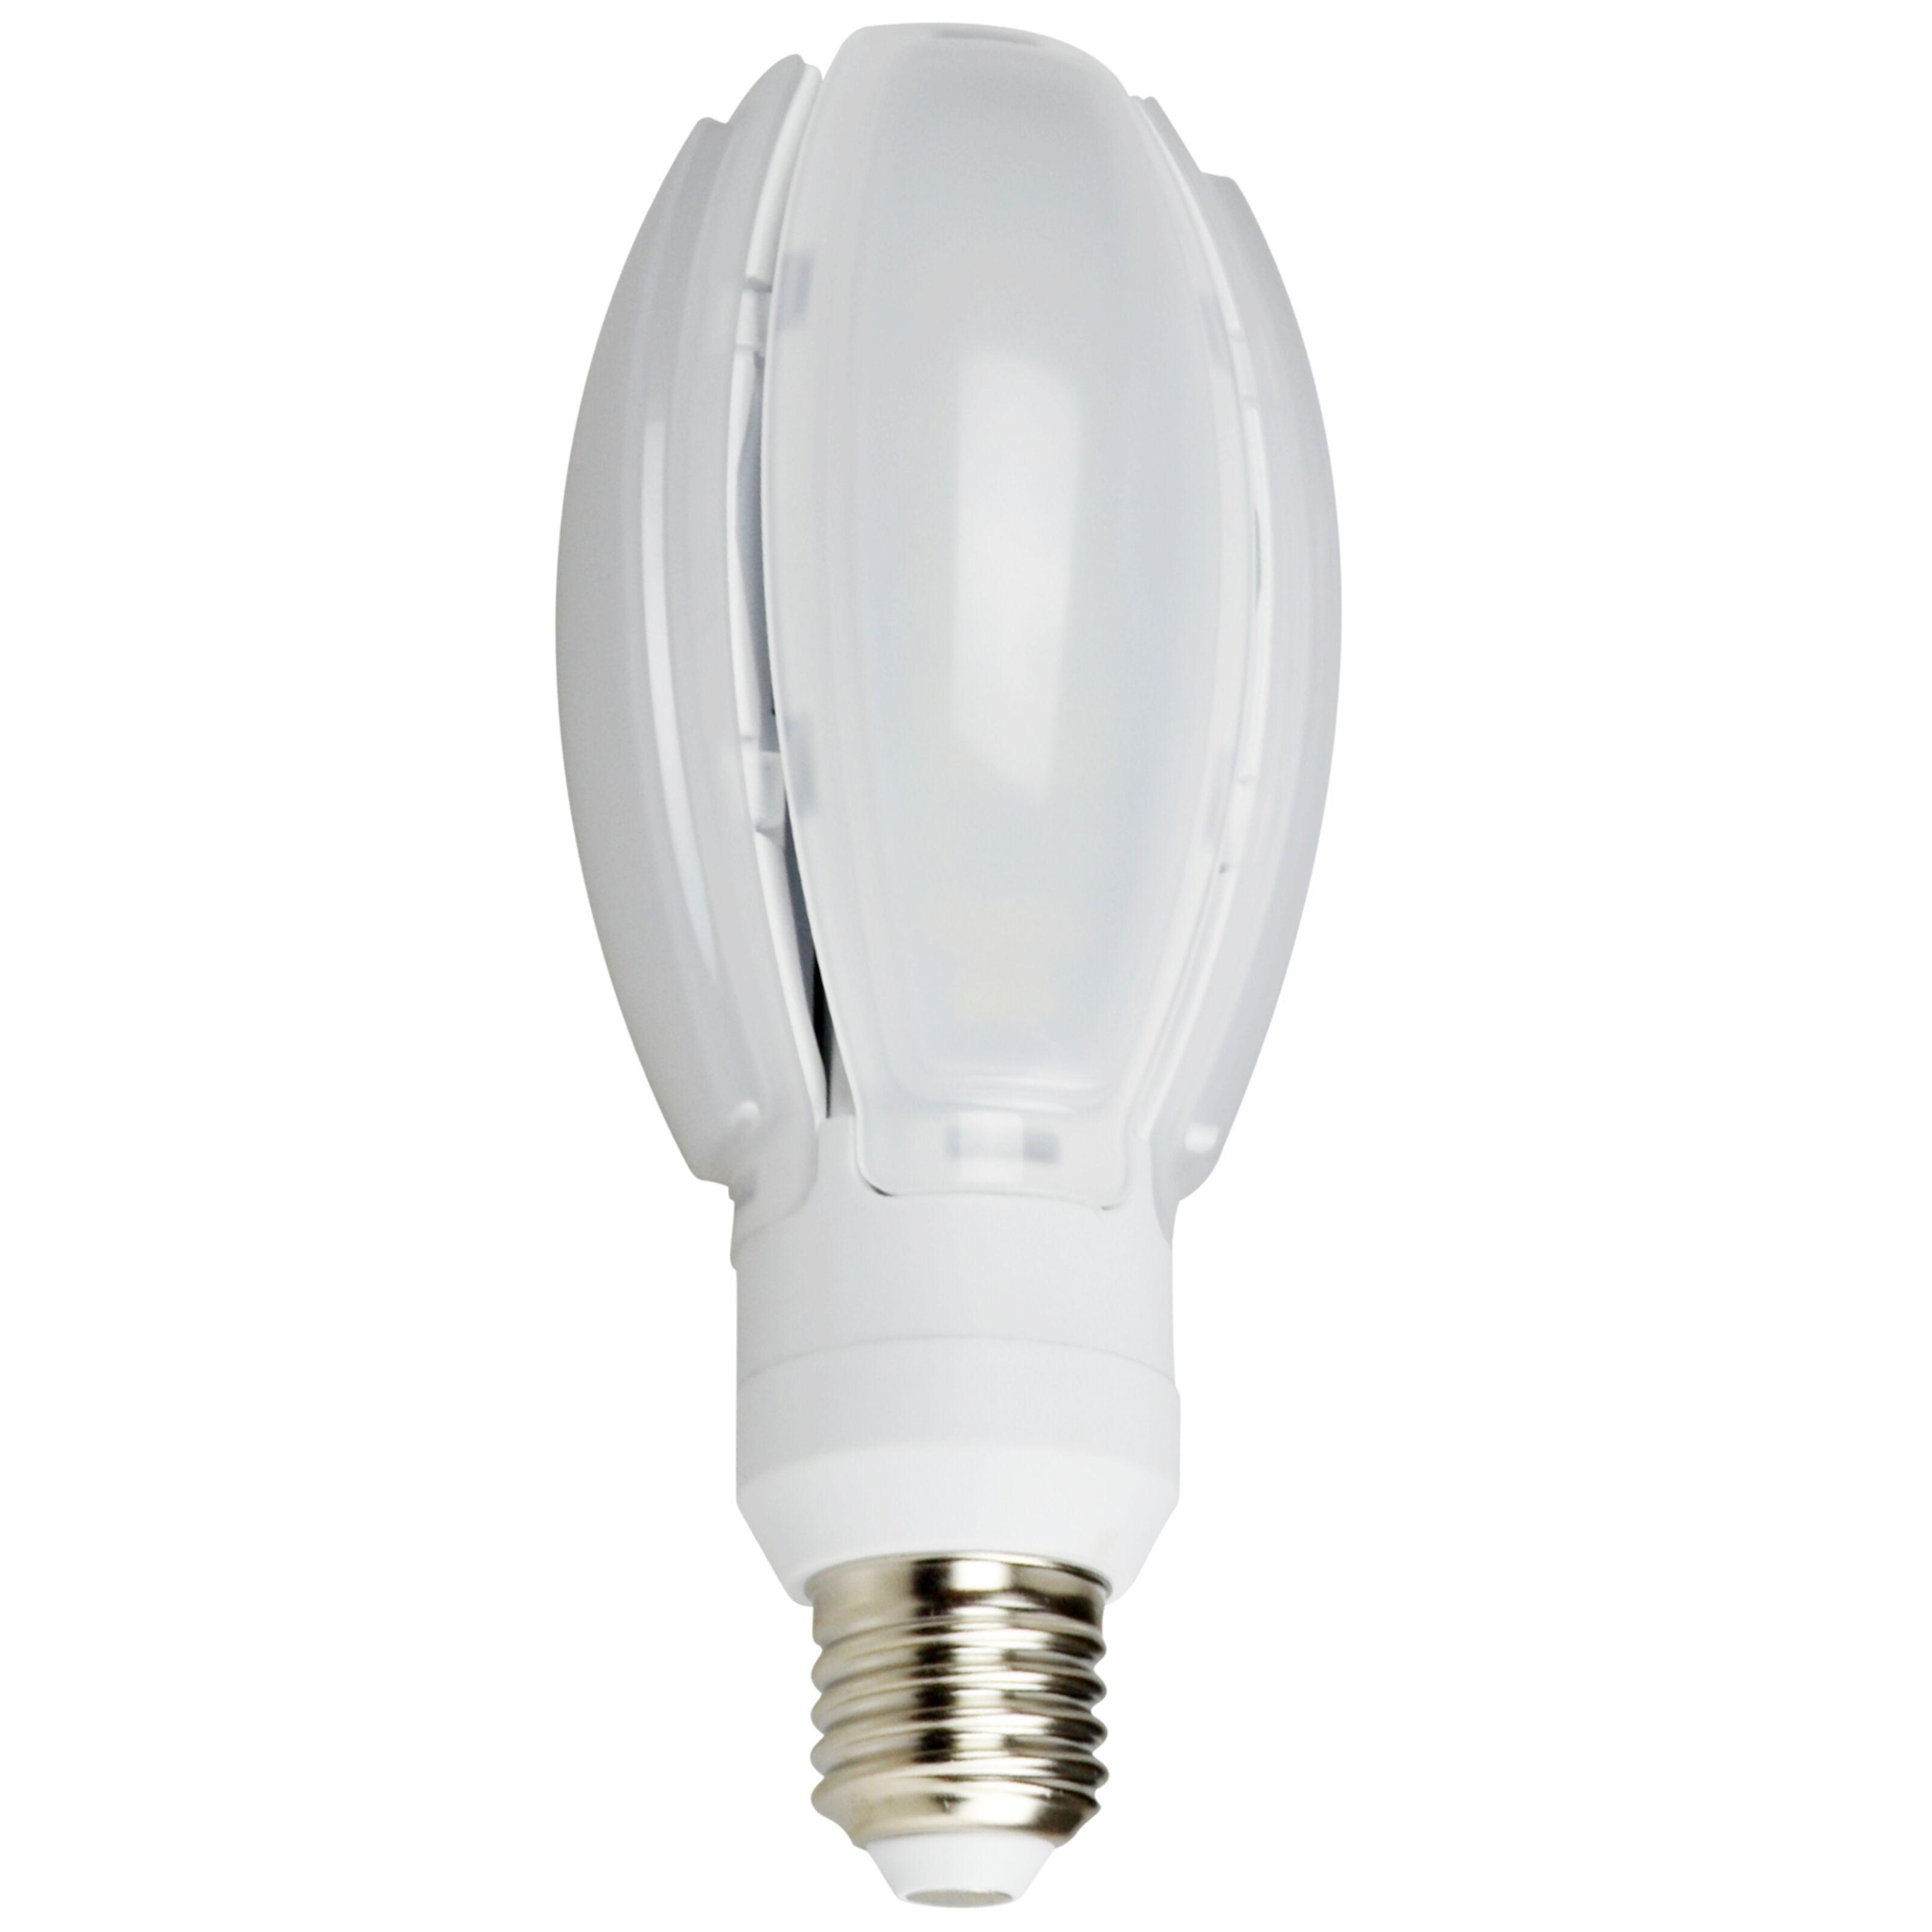 LED Gårdslampa E27 3500 lm LED lampor |